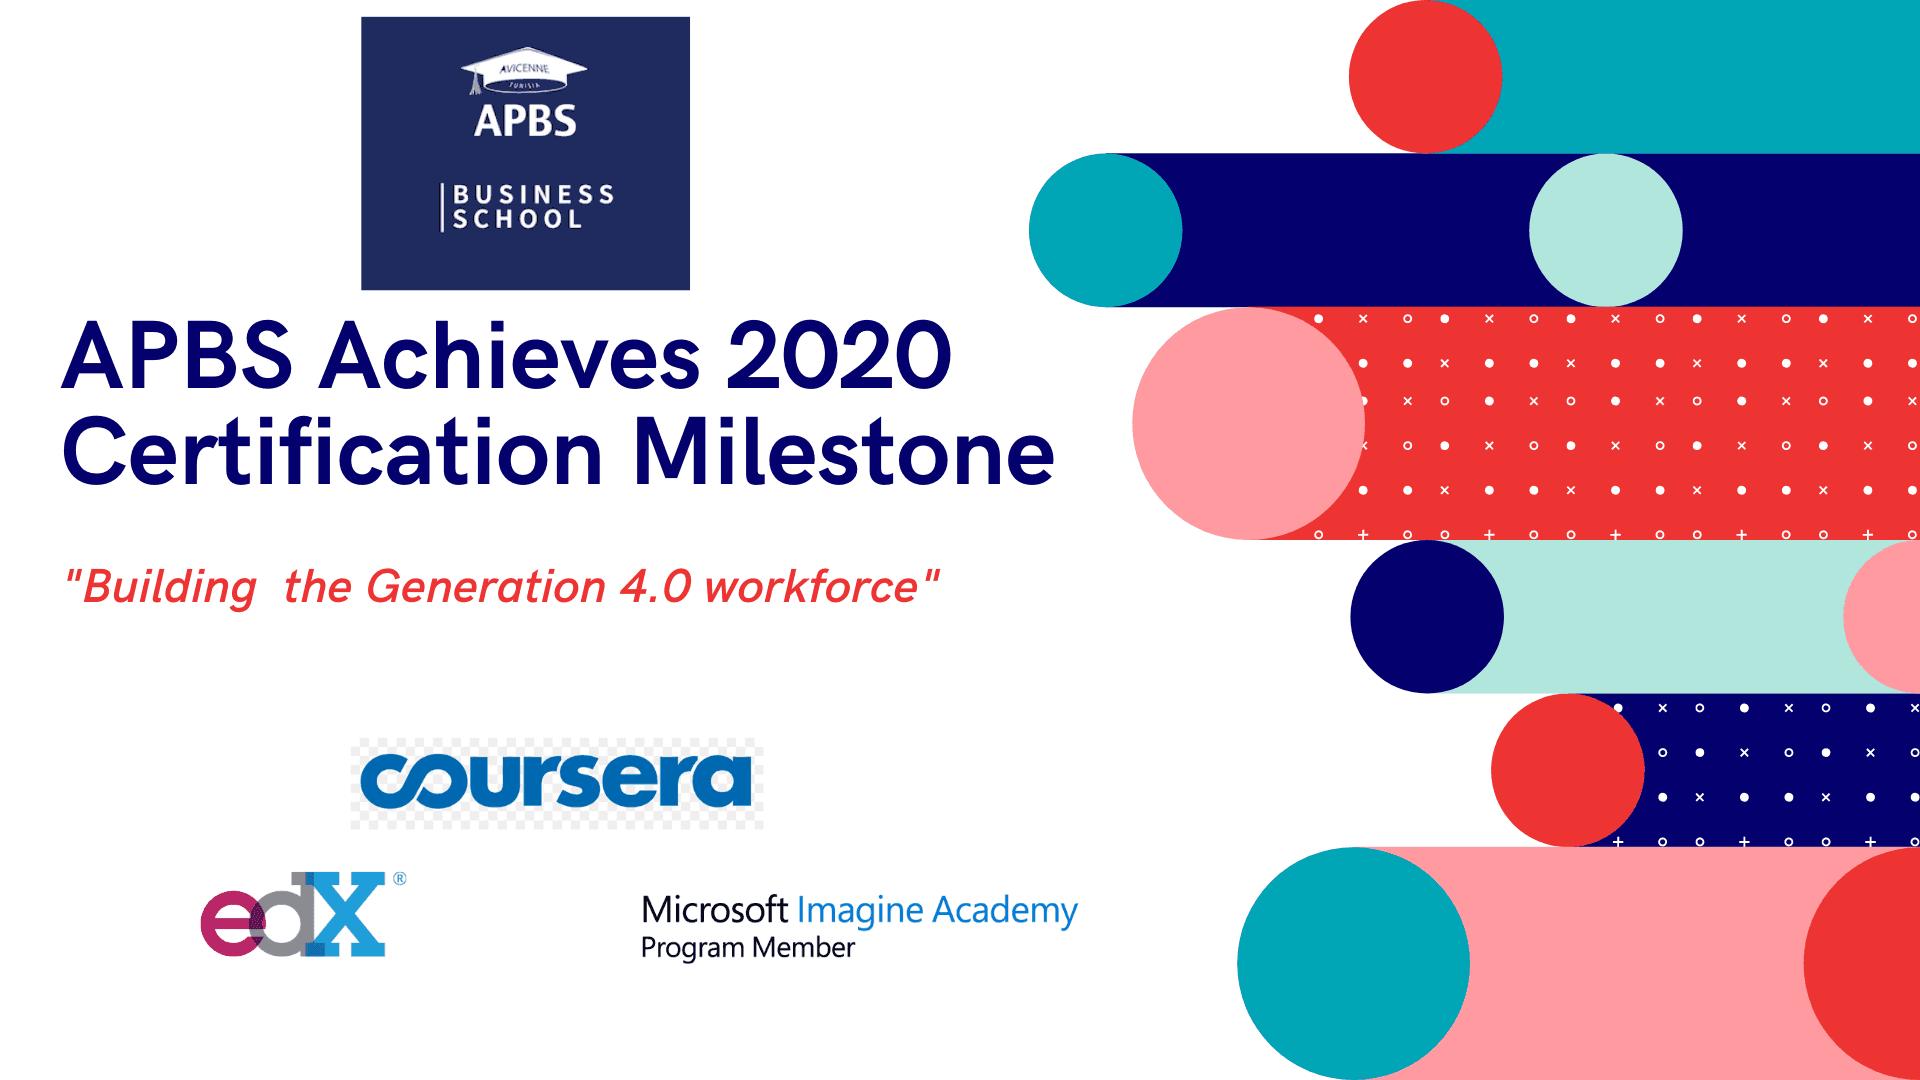 APBS Achieves 2020 Certification Milestone 7